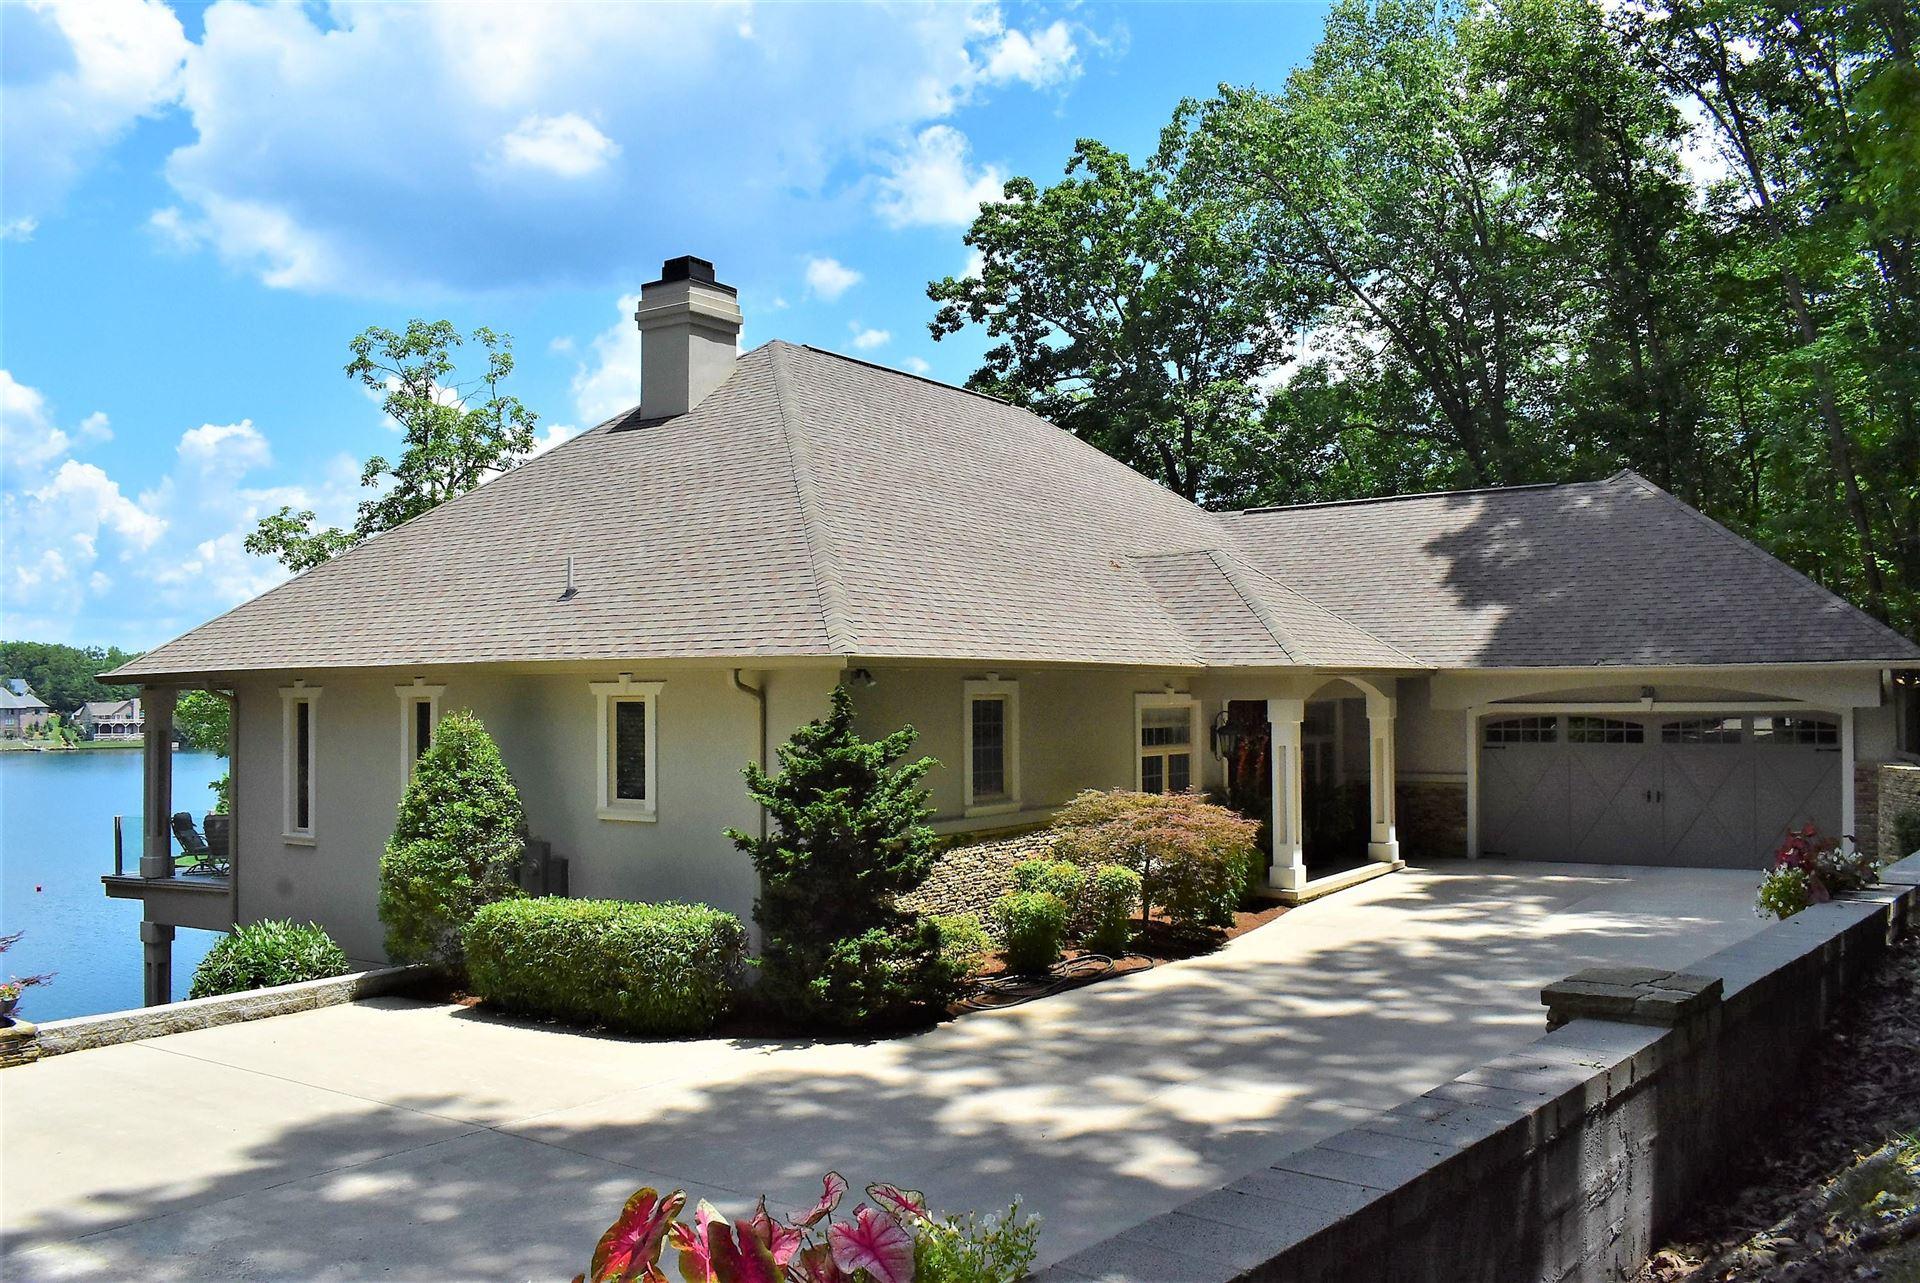 70 Chelteham Lane, Fairfield Glade, TN 38558 - MLS#: 1159186